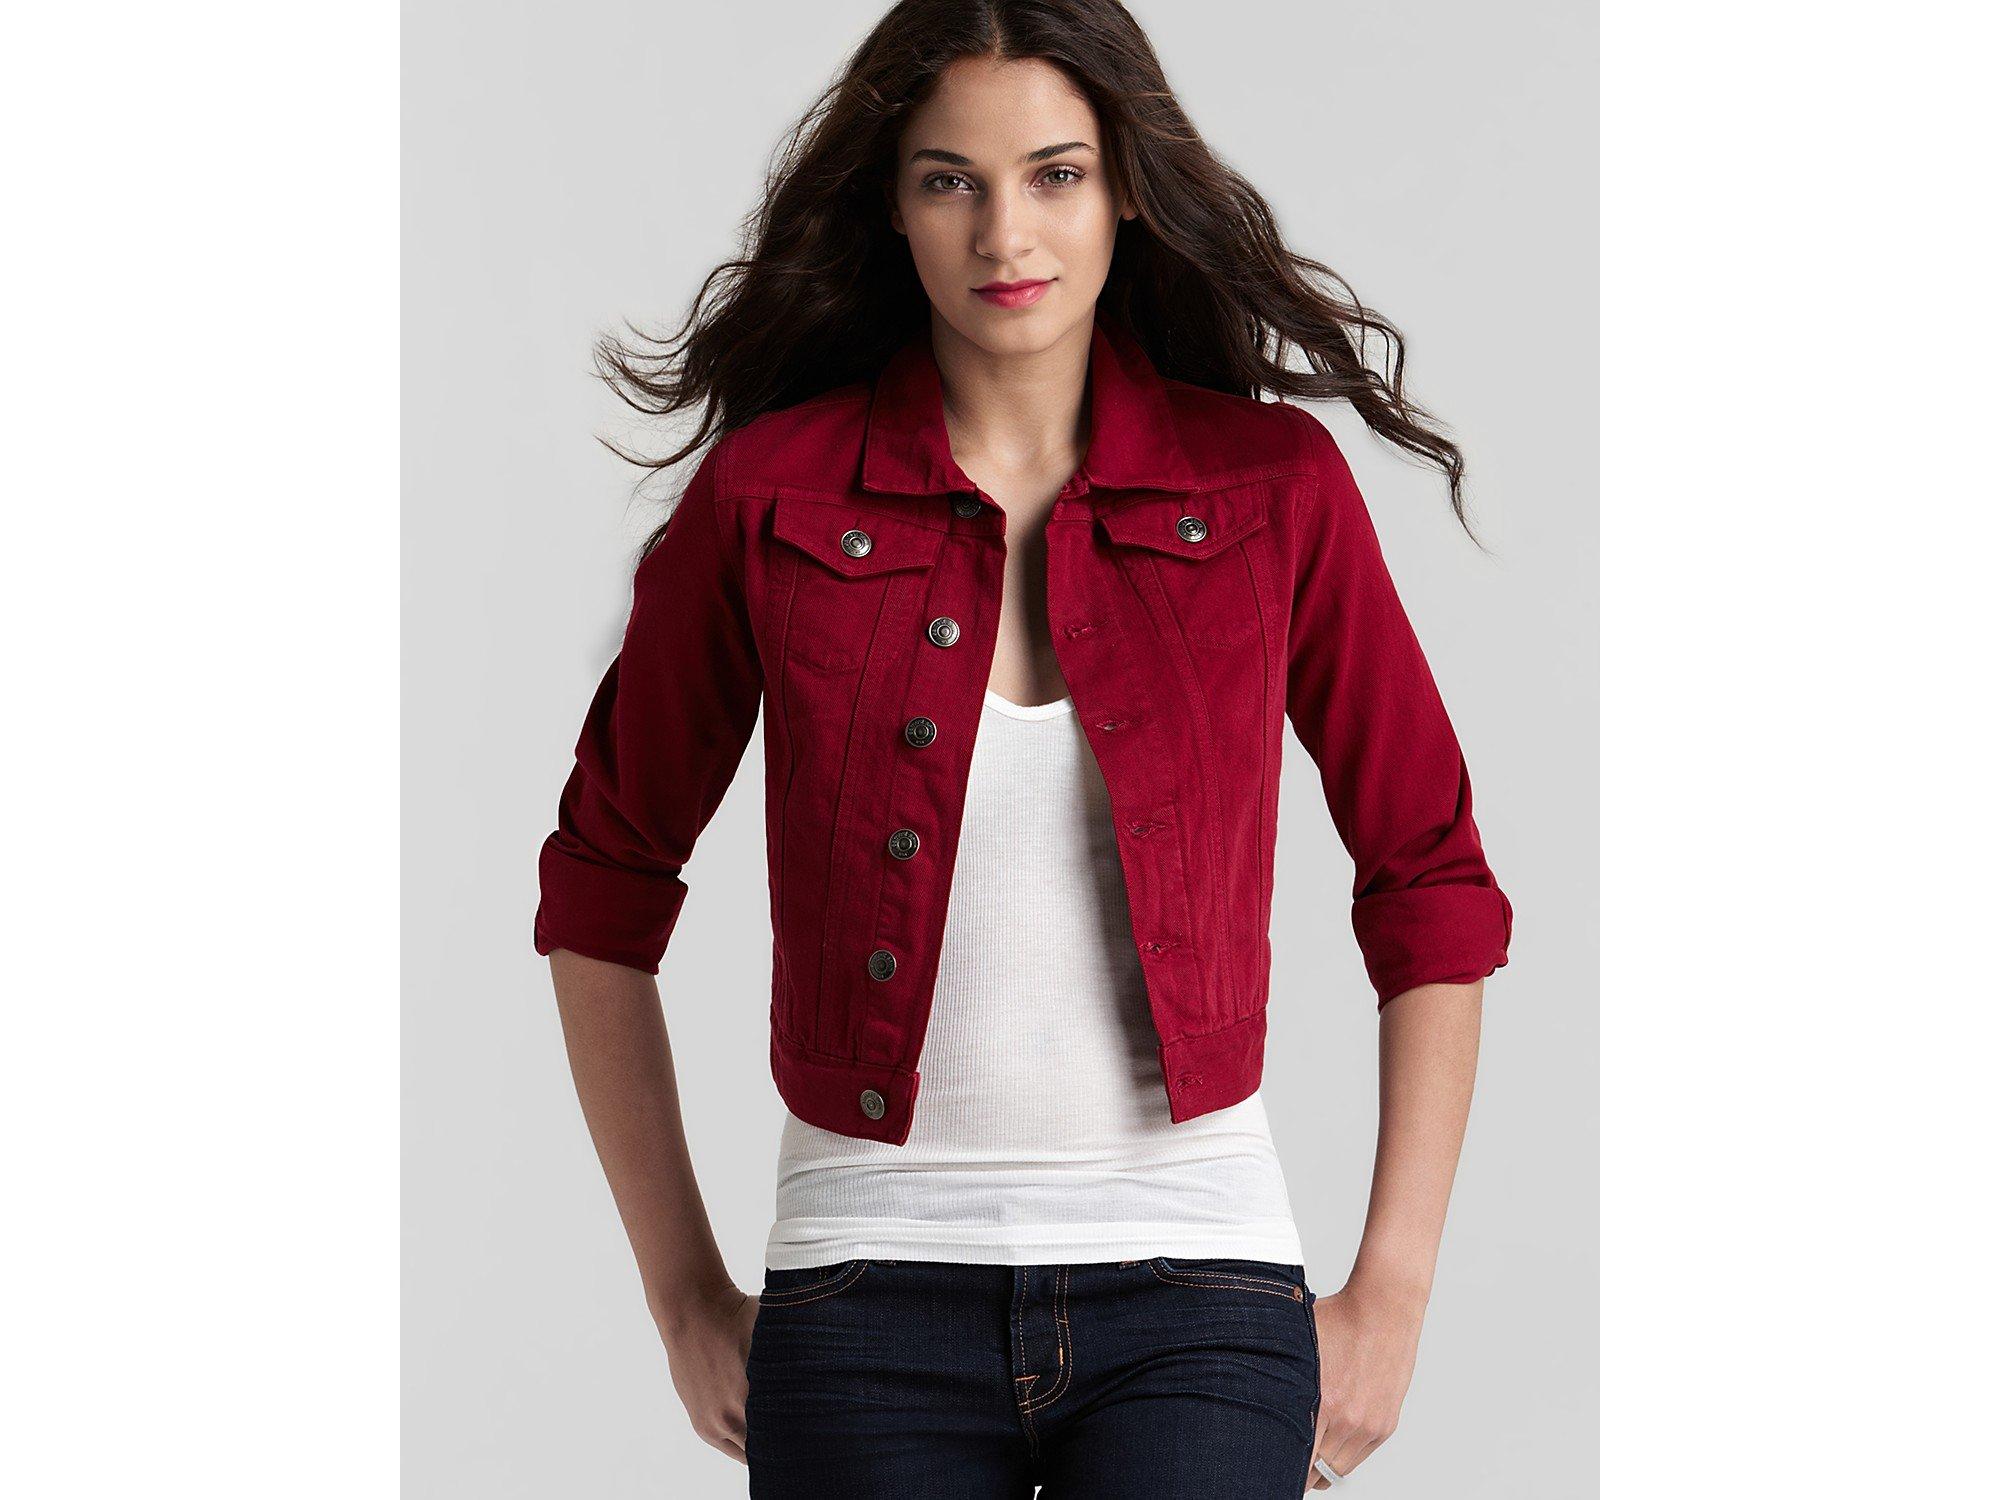 Earnest sewn Denim Jacket in Cabernet in Red | Lyst